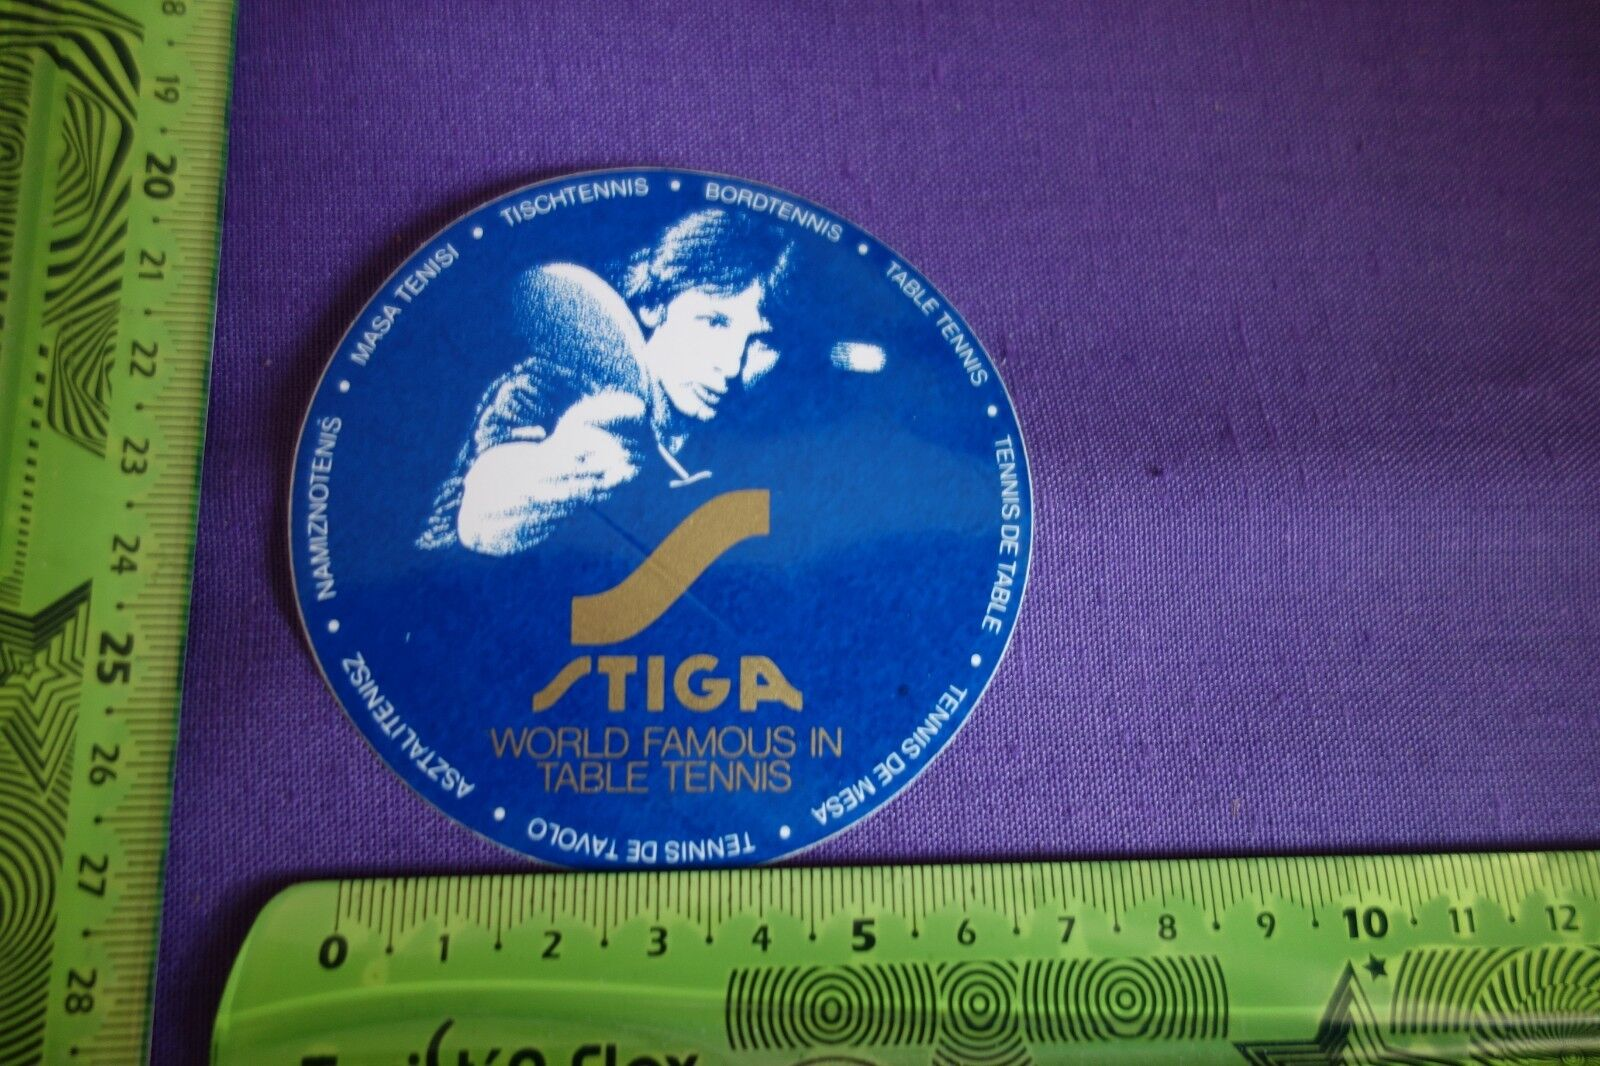 Alter Aufkleber Tischtennis Bordtennis STIGA WORLD FAMOUS IN TABLE TENNIS